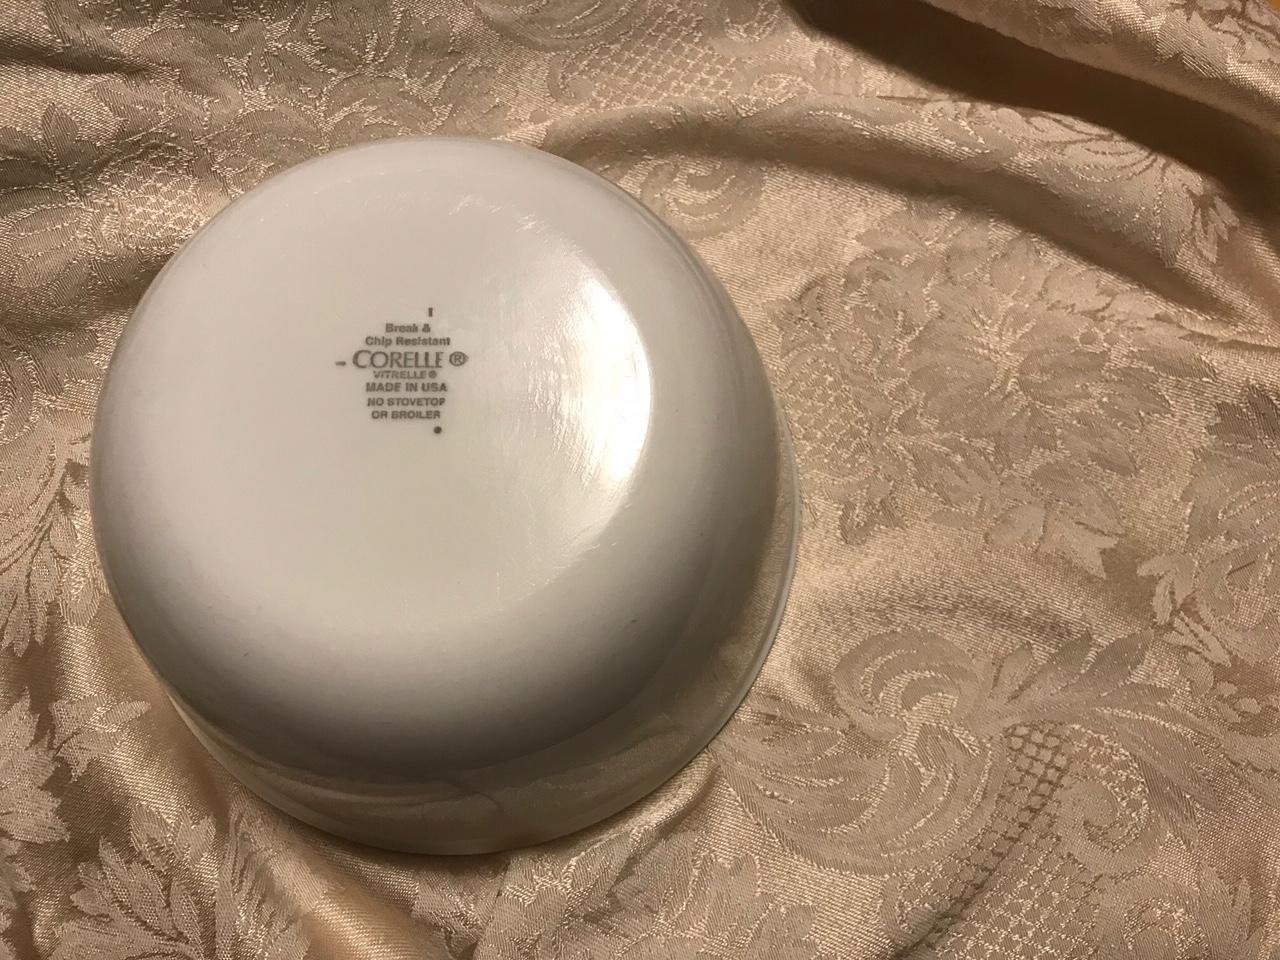 Corelle Vitrelle Plain White Bowl, Purchased New in 2017: Lead Free